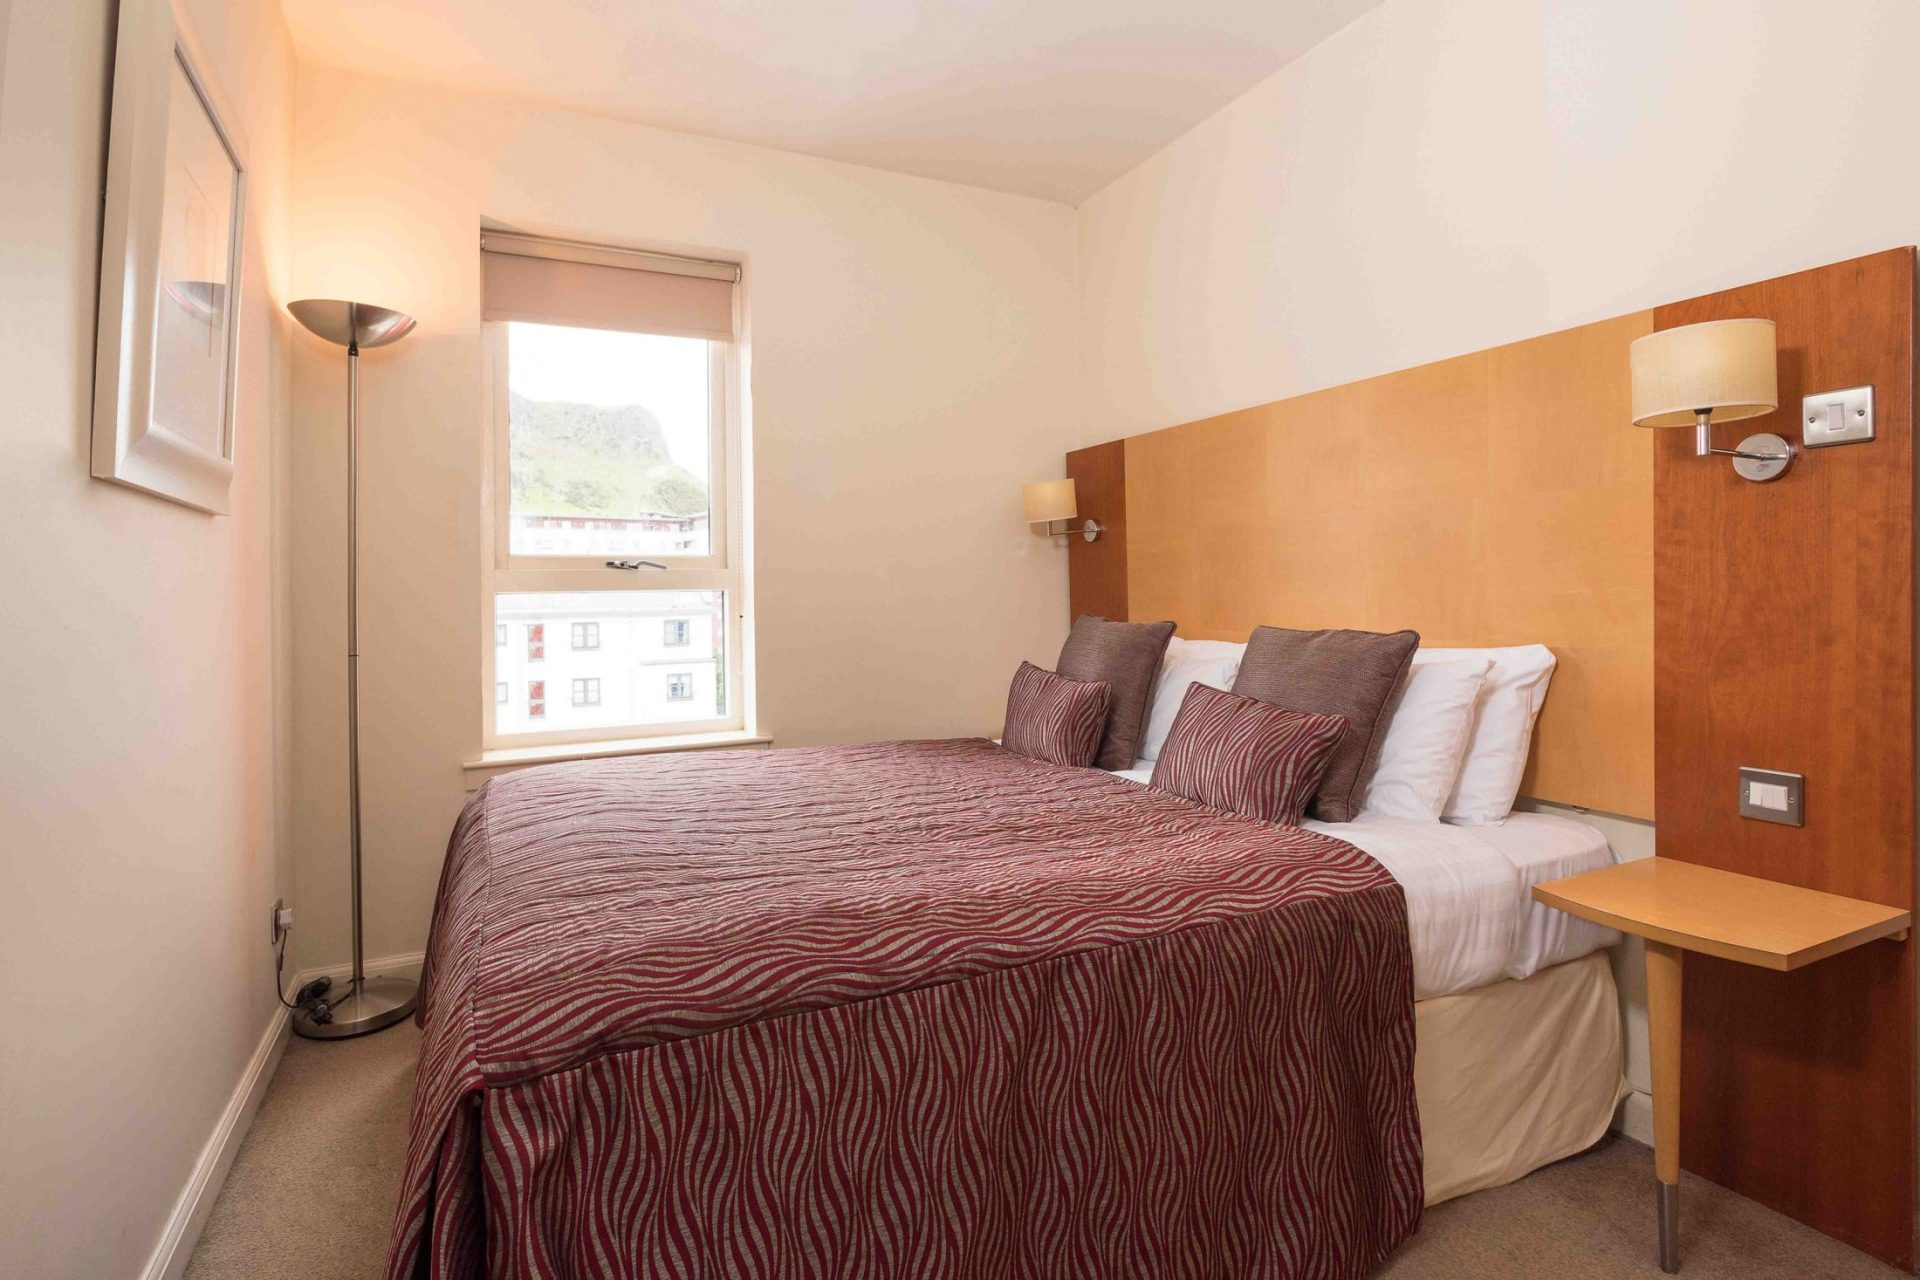 edinburgh-collection-hotel-rooms